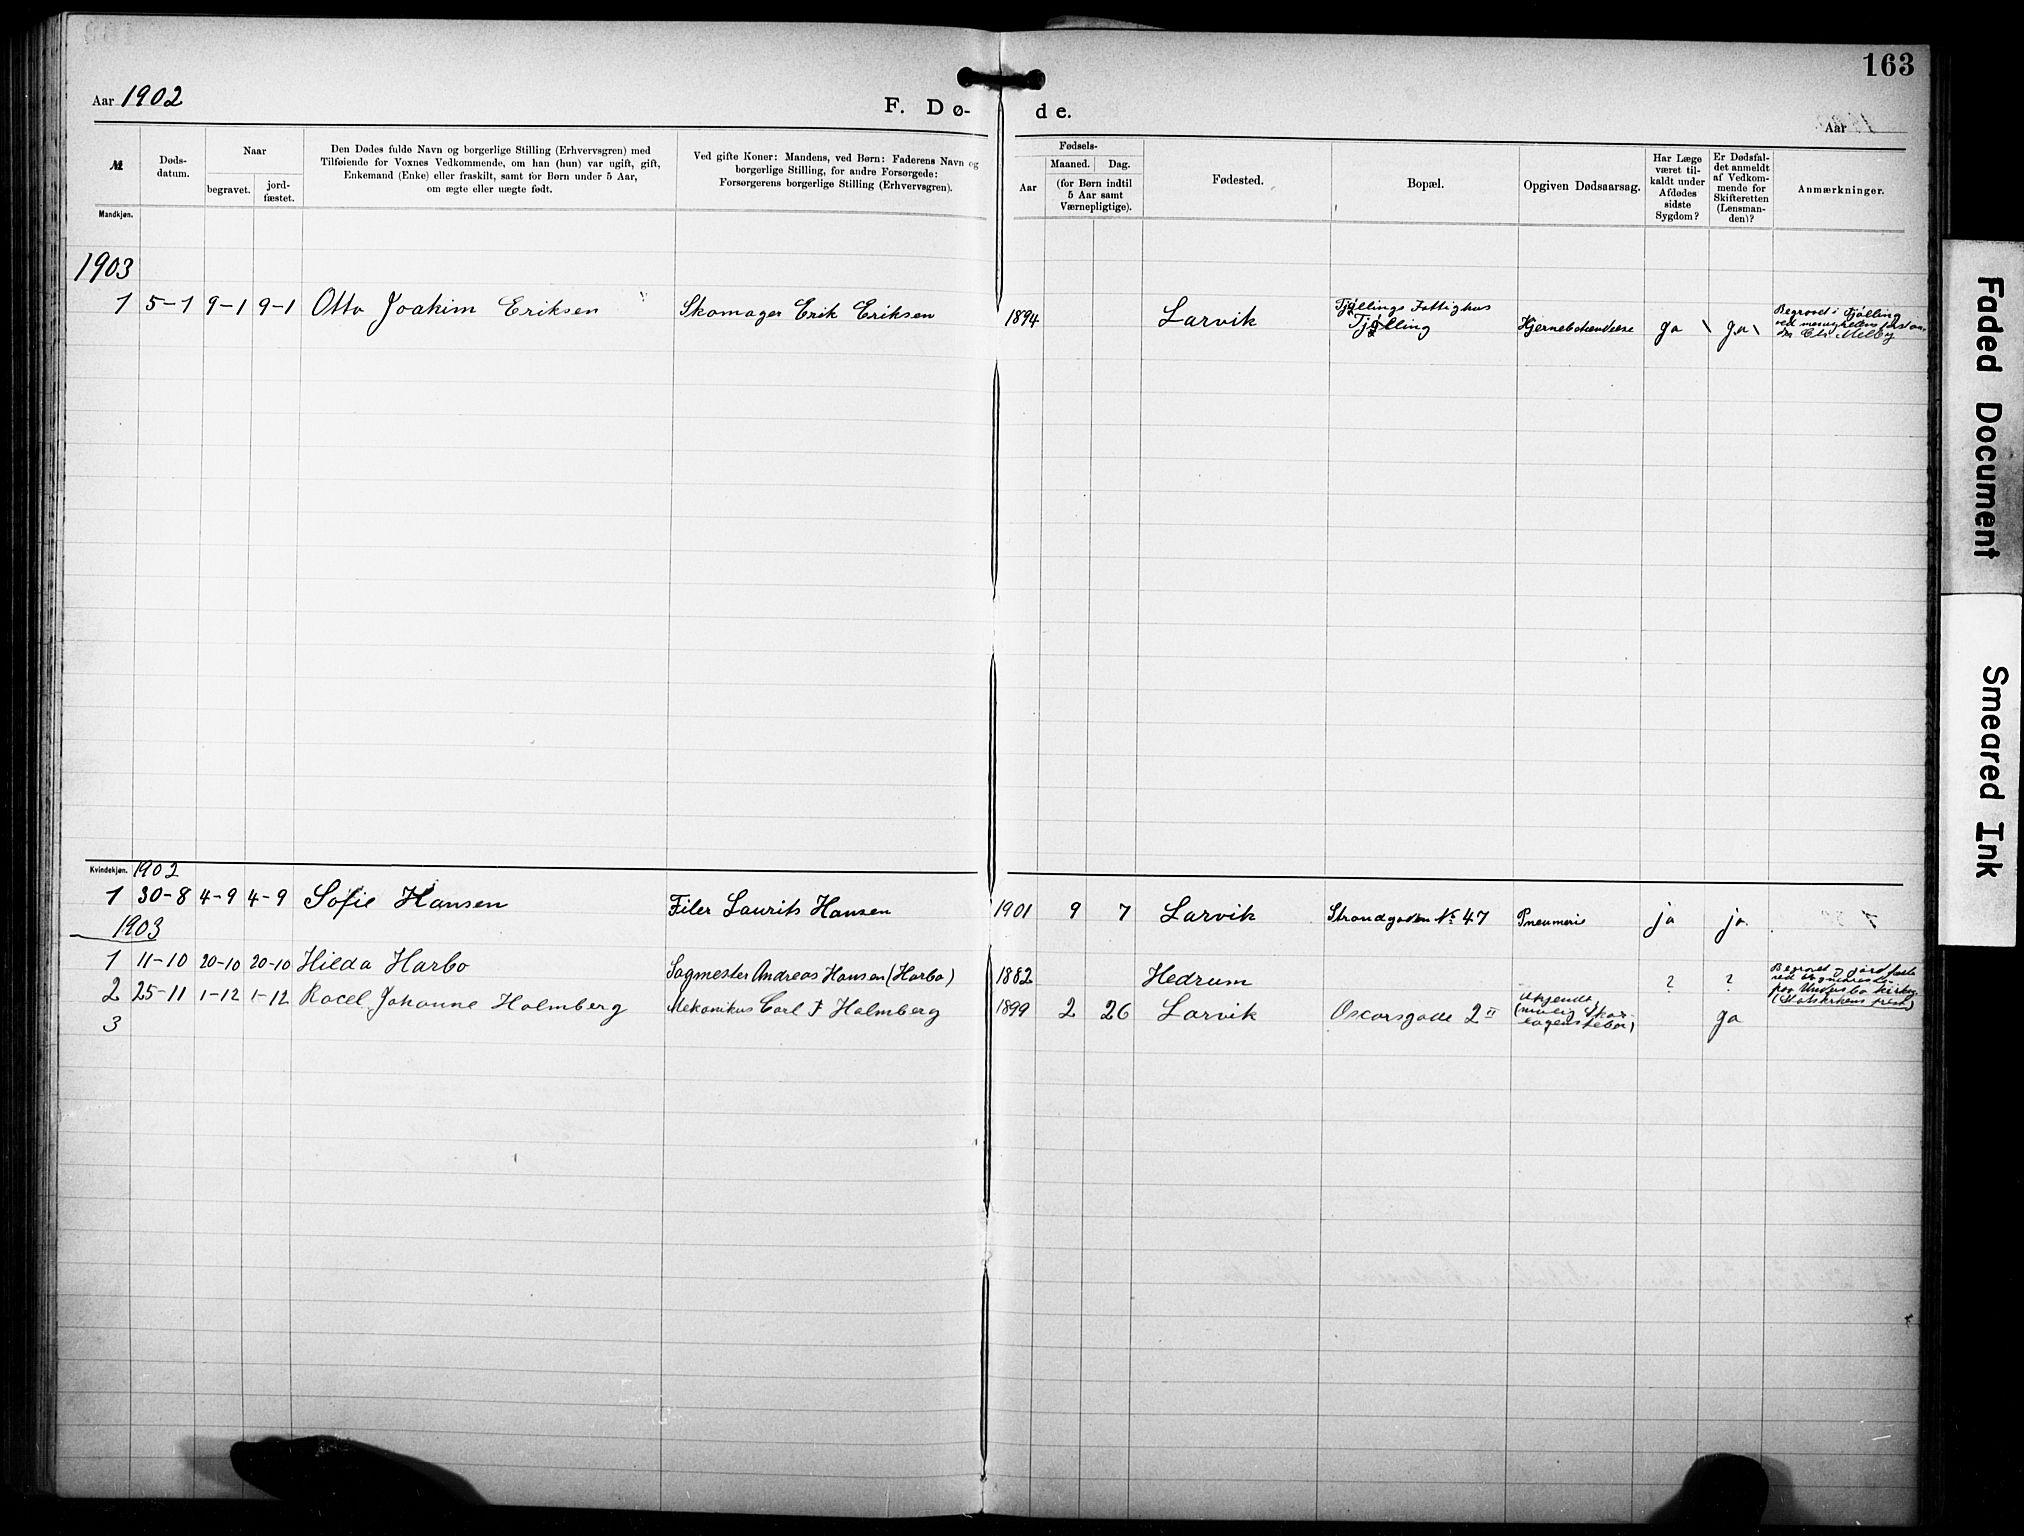 SAKO, Den katolsk-apostoliske menighet i Larvik, F/Fa/L0001: Dissenterprotokoll nr. 1, 1892-1933, s. 163